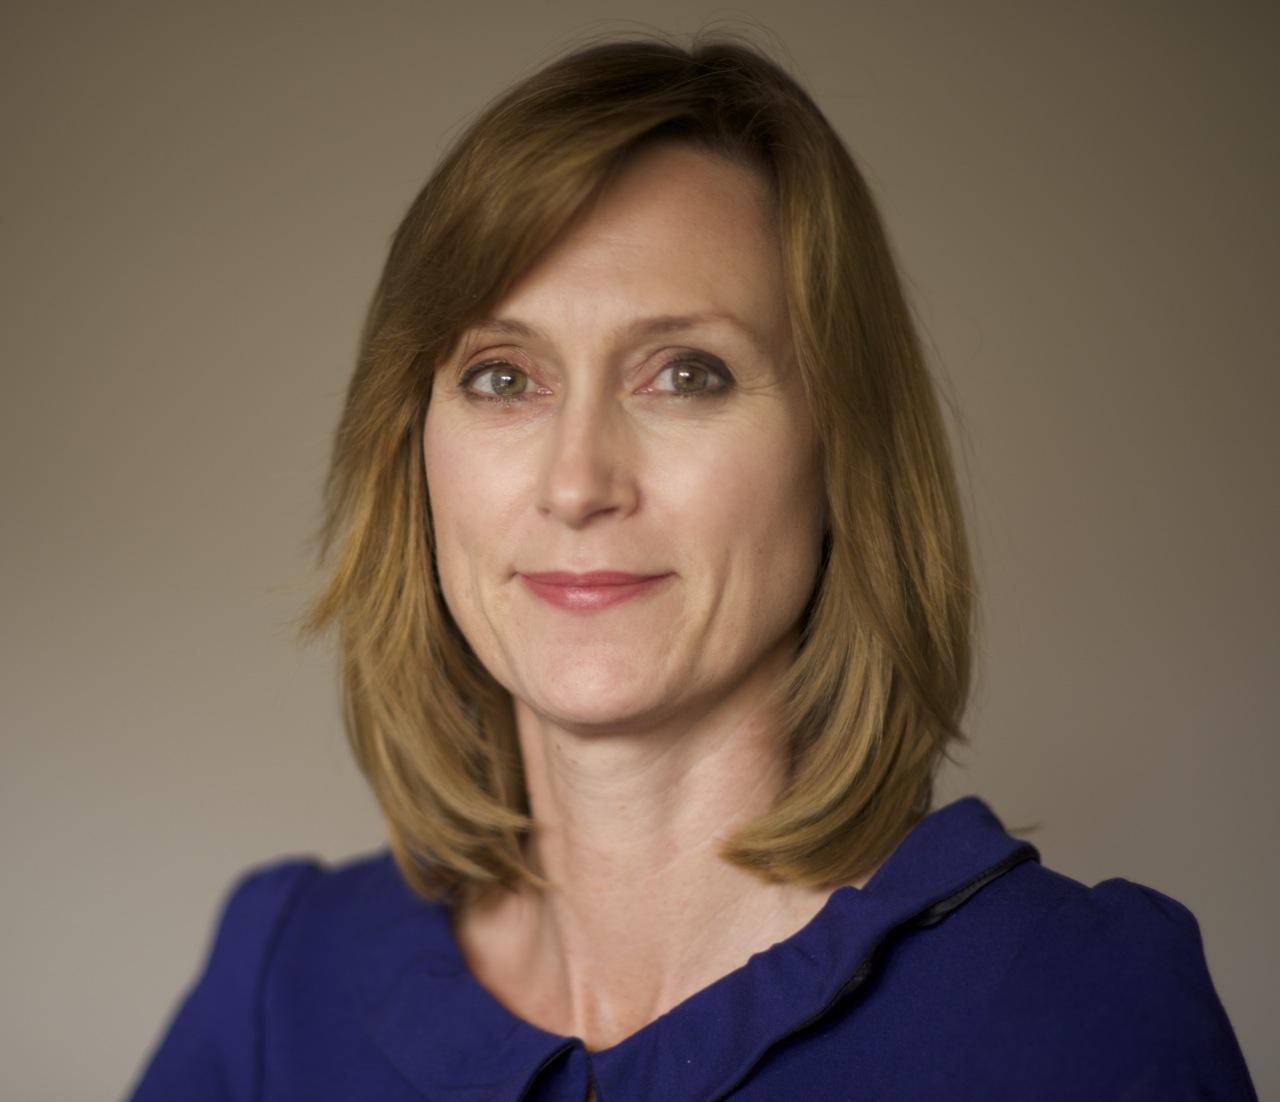 Carolien Foley